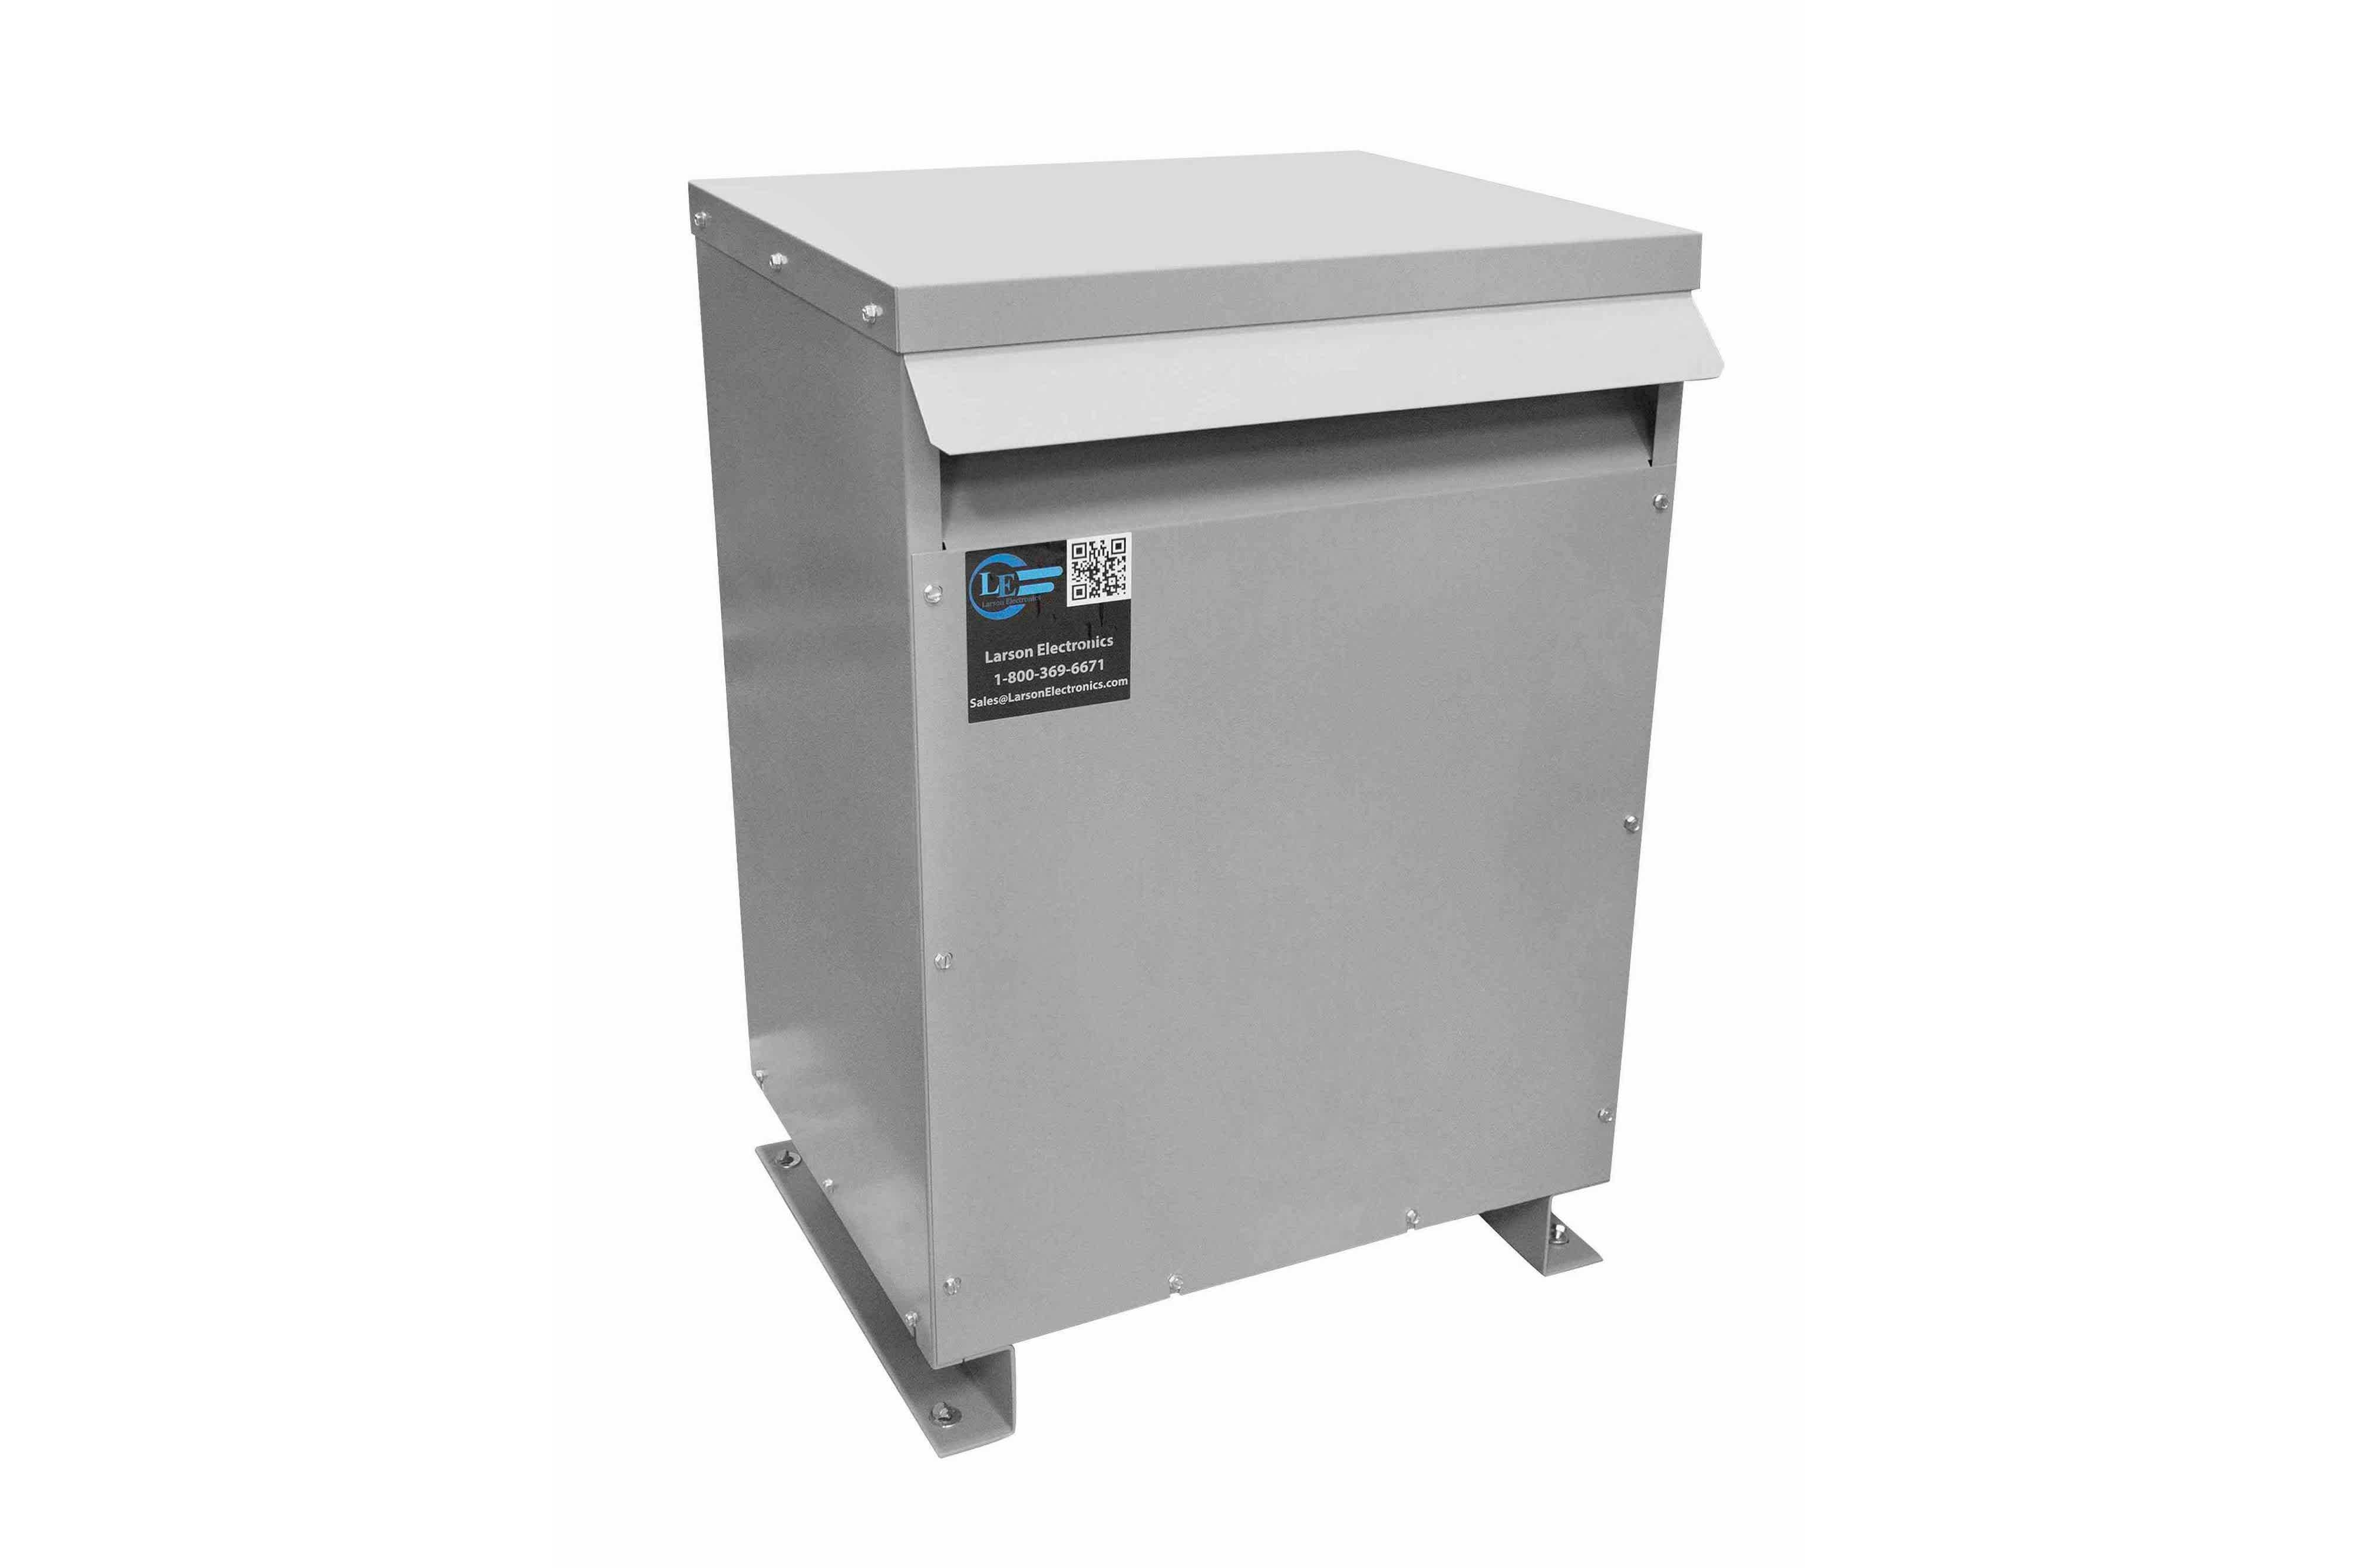 115 kVA 3PH Isolation Transformer, 208V Wye Primary, 415Y/240 Wye-N Secondary, N3R, Ventilated, 60 Hz